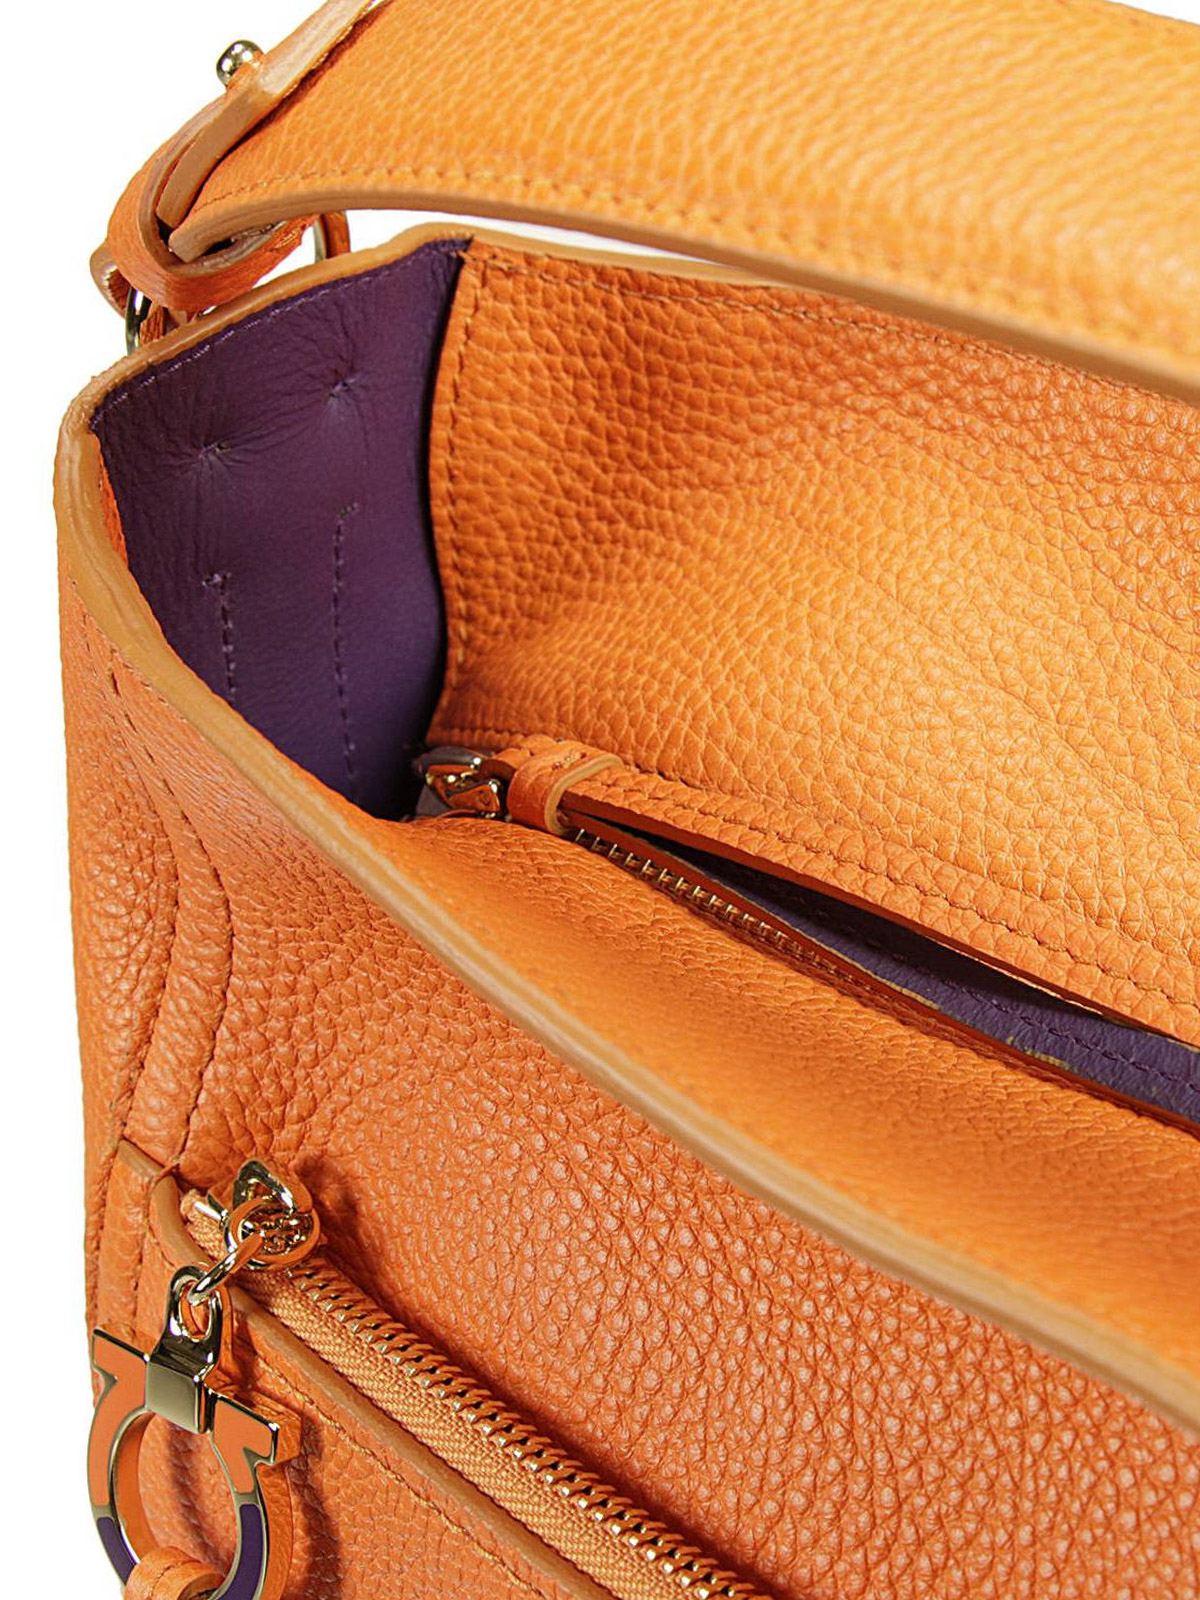 556e24b2b1 Salvatore Ferragamo - Ally hobo bag - shoulder bags - 21F574 629515